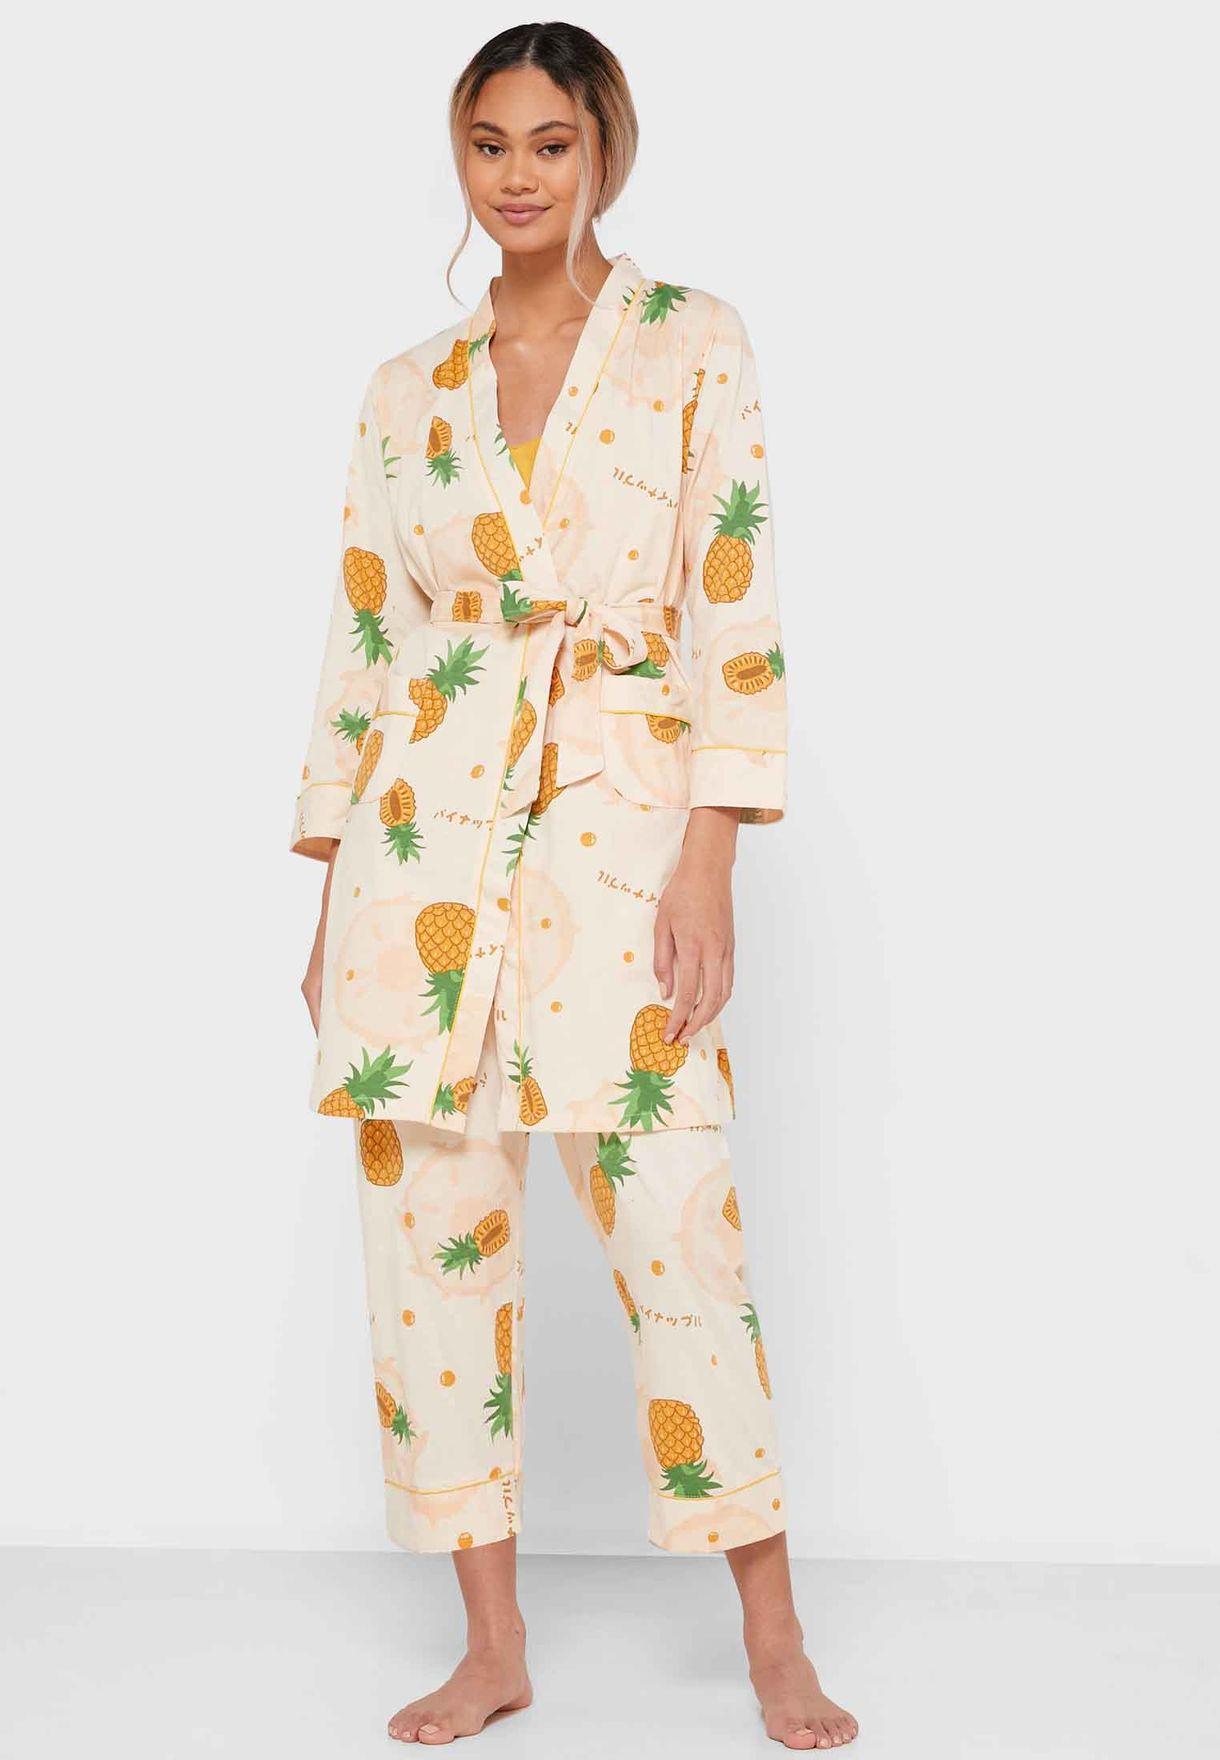 3 in 1 Printed Pyjama set